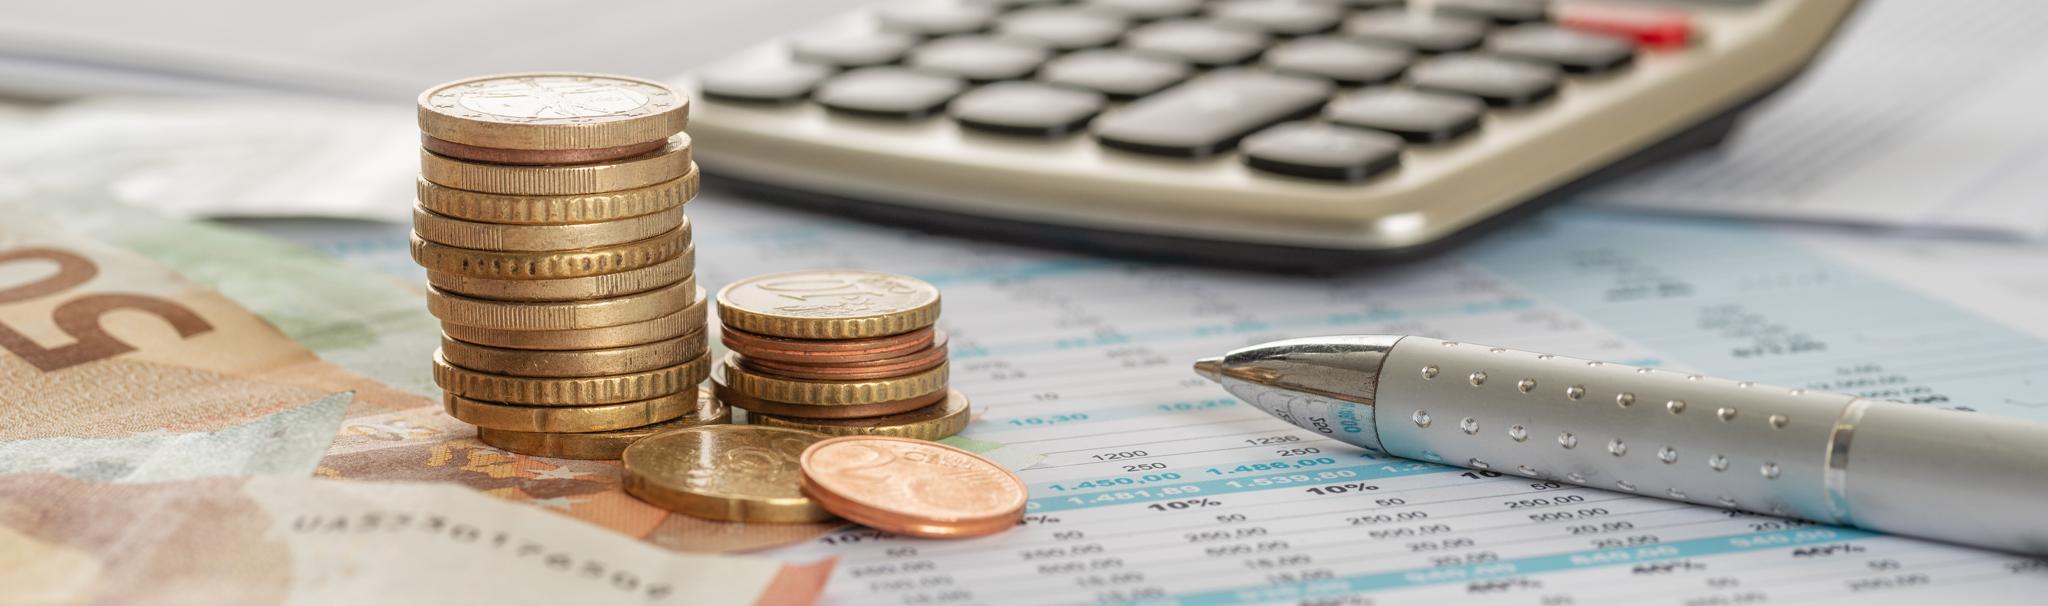 photo of money and calculator